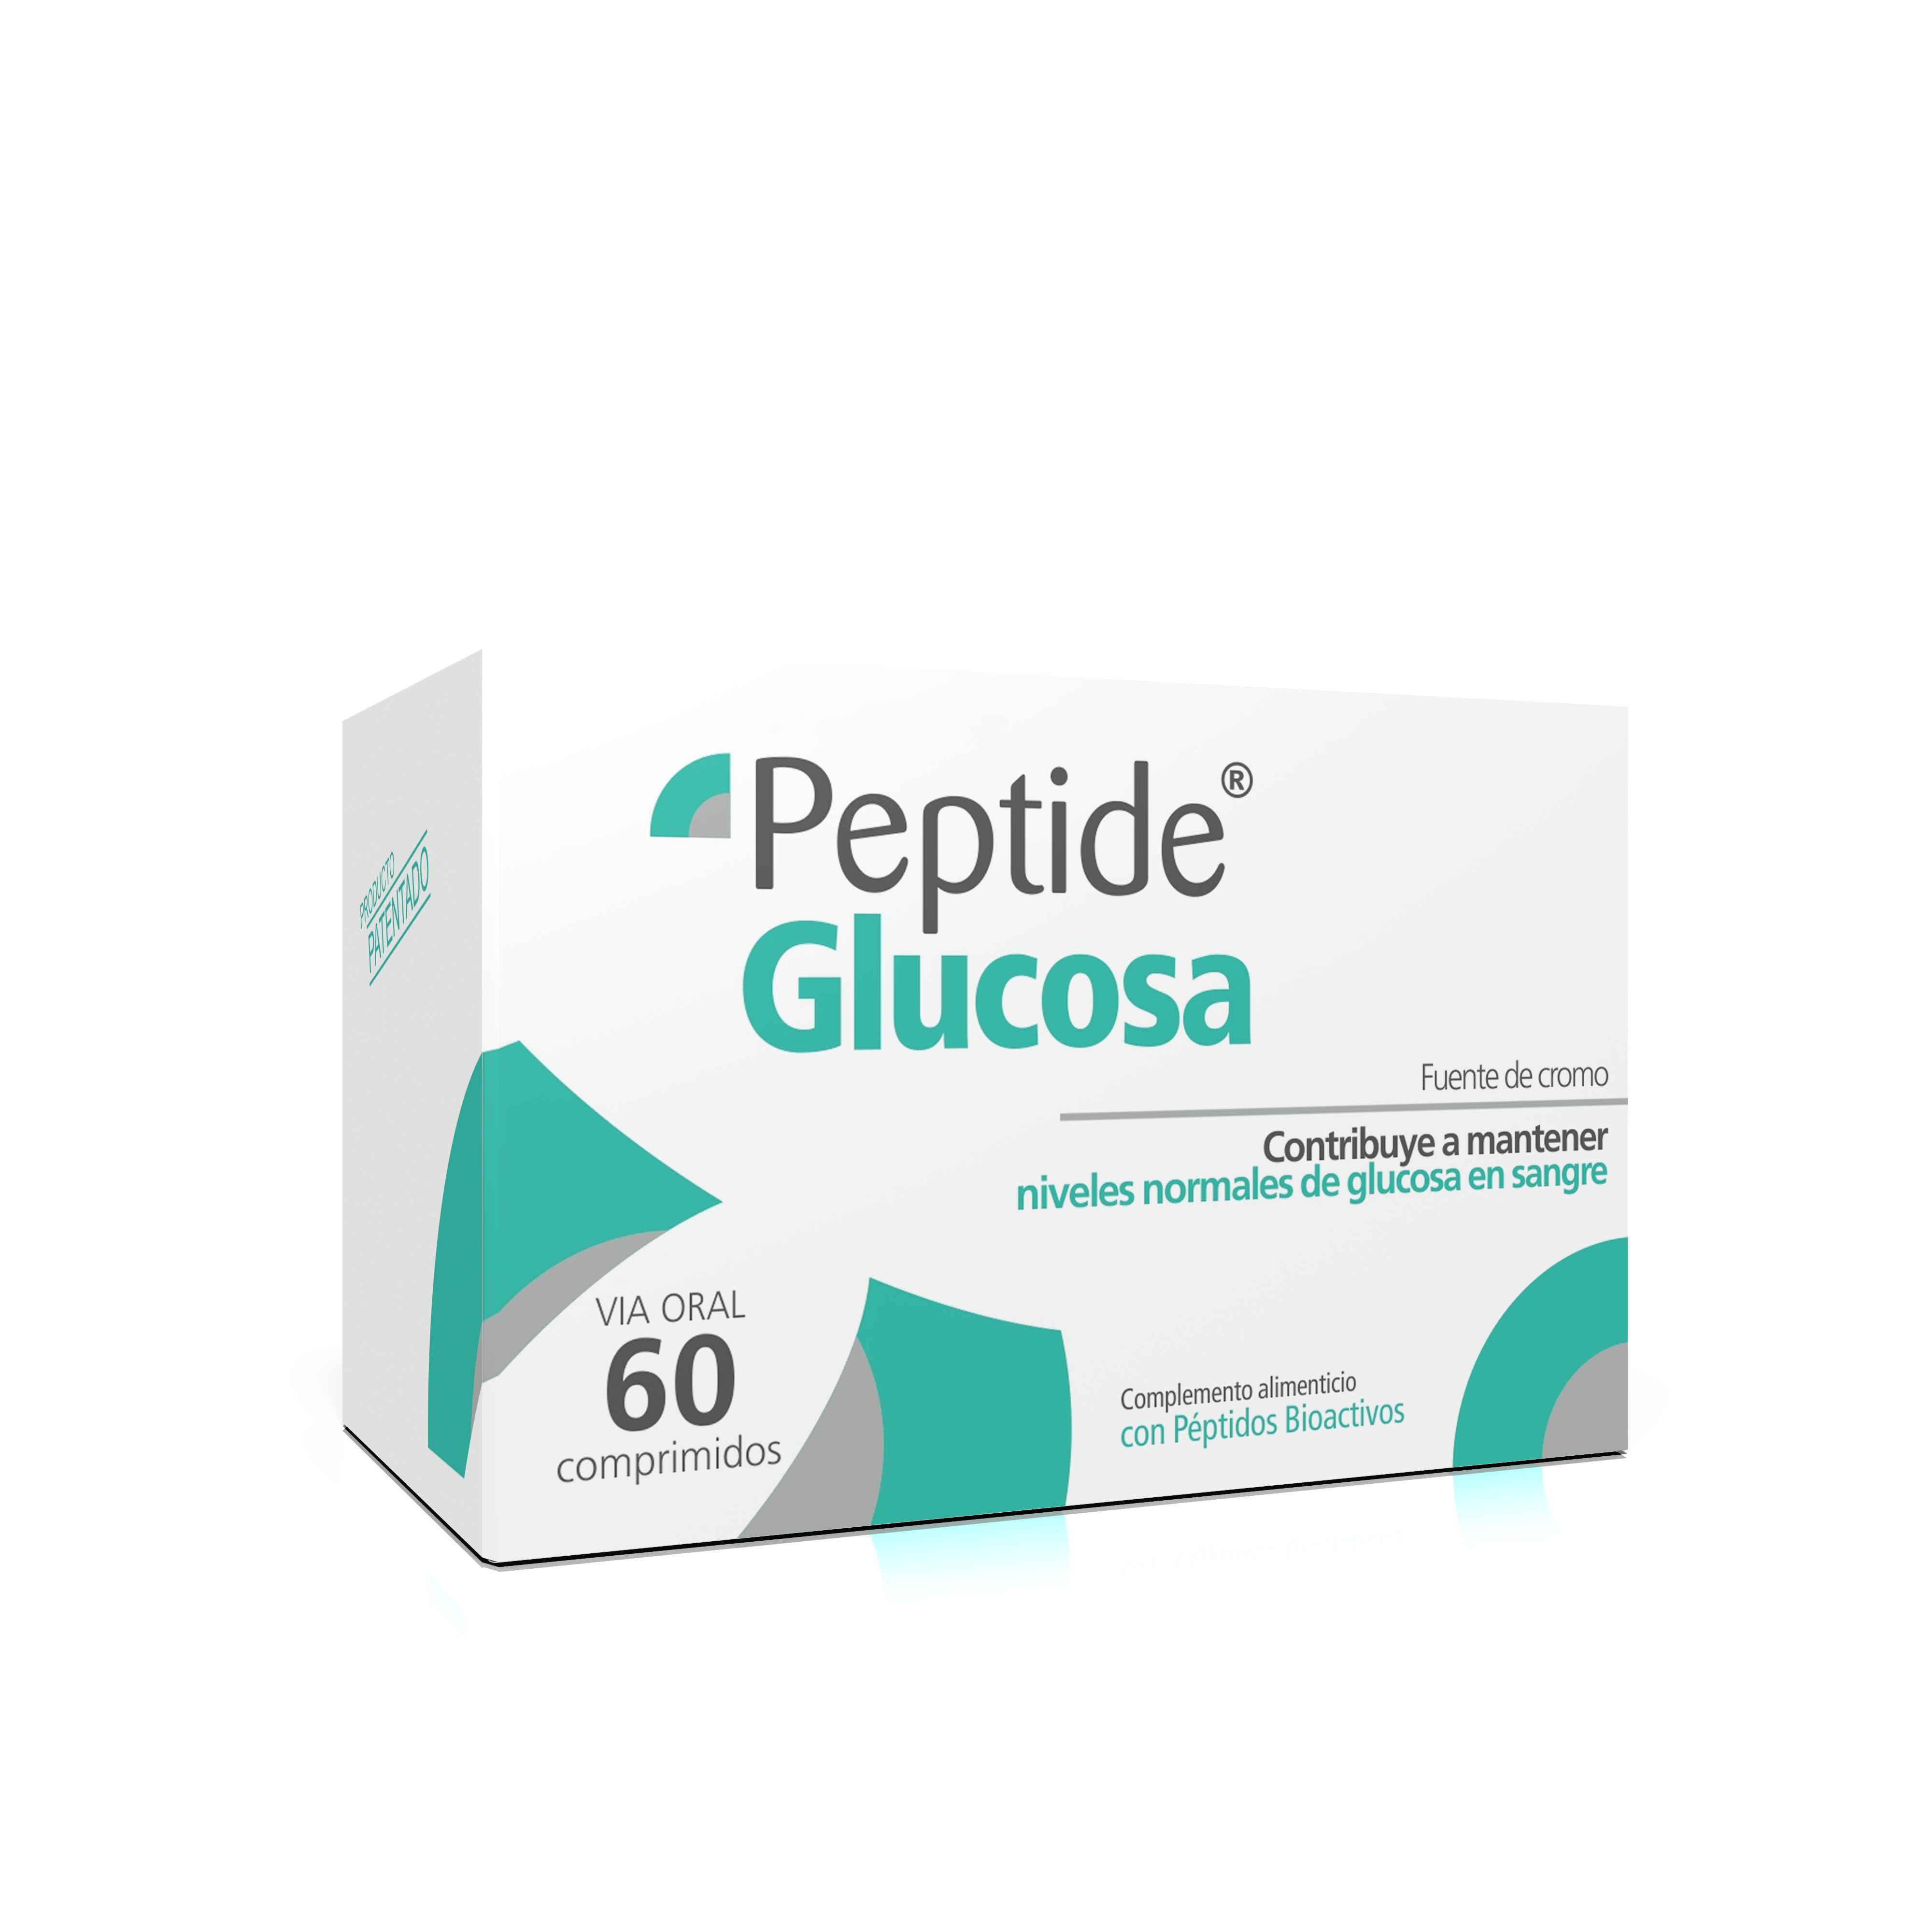 Fotografia Peptide Glucosa